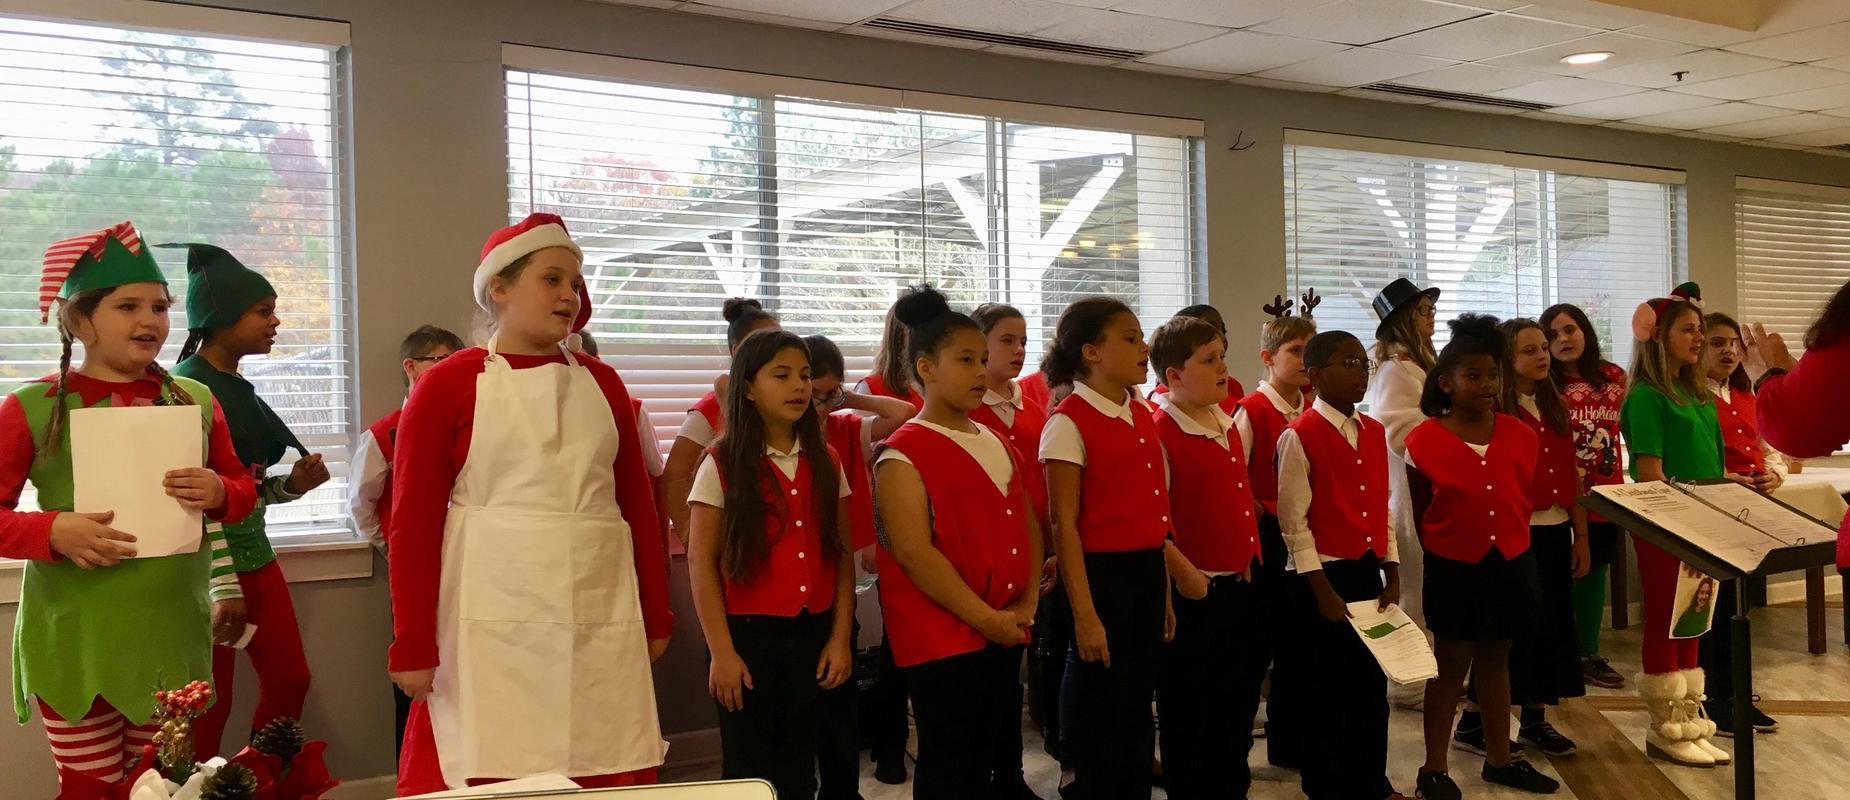 Chorus in the community